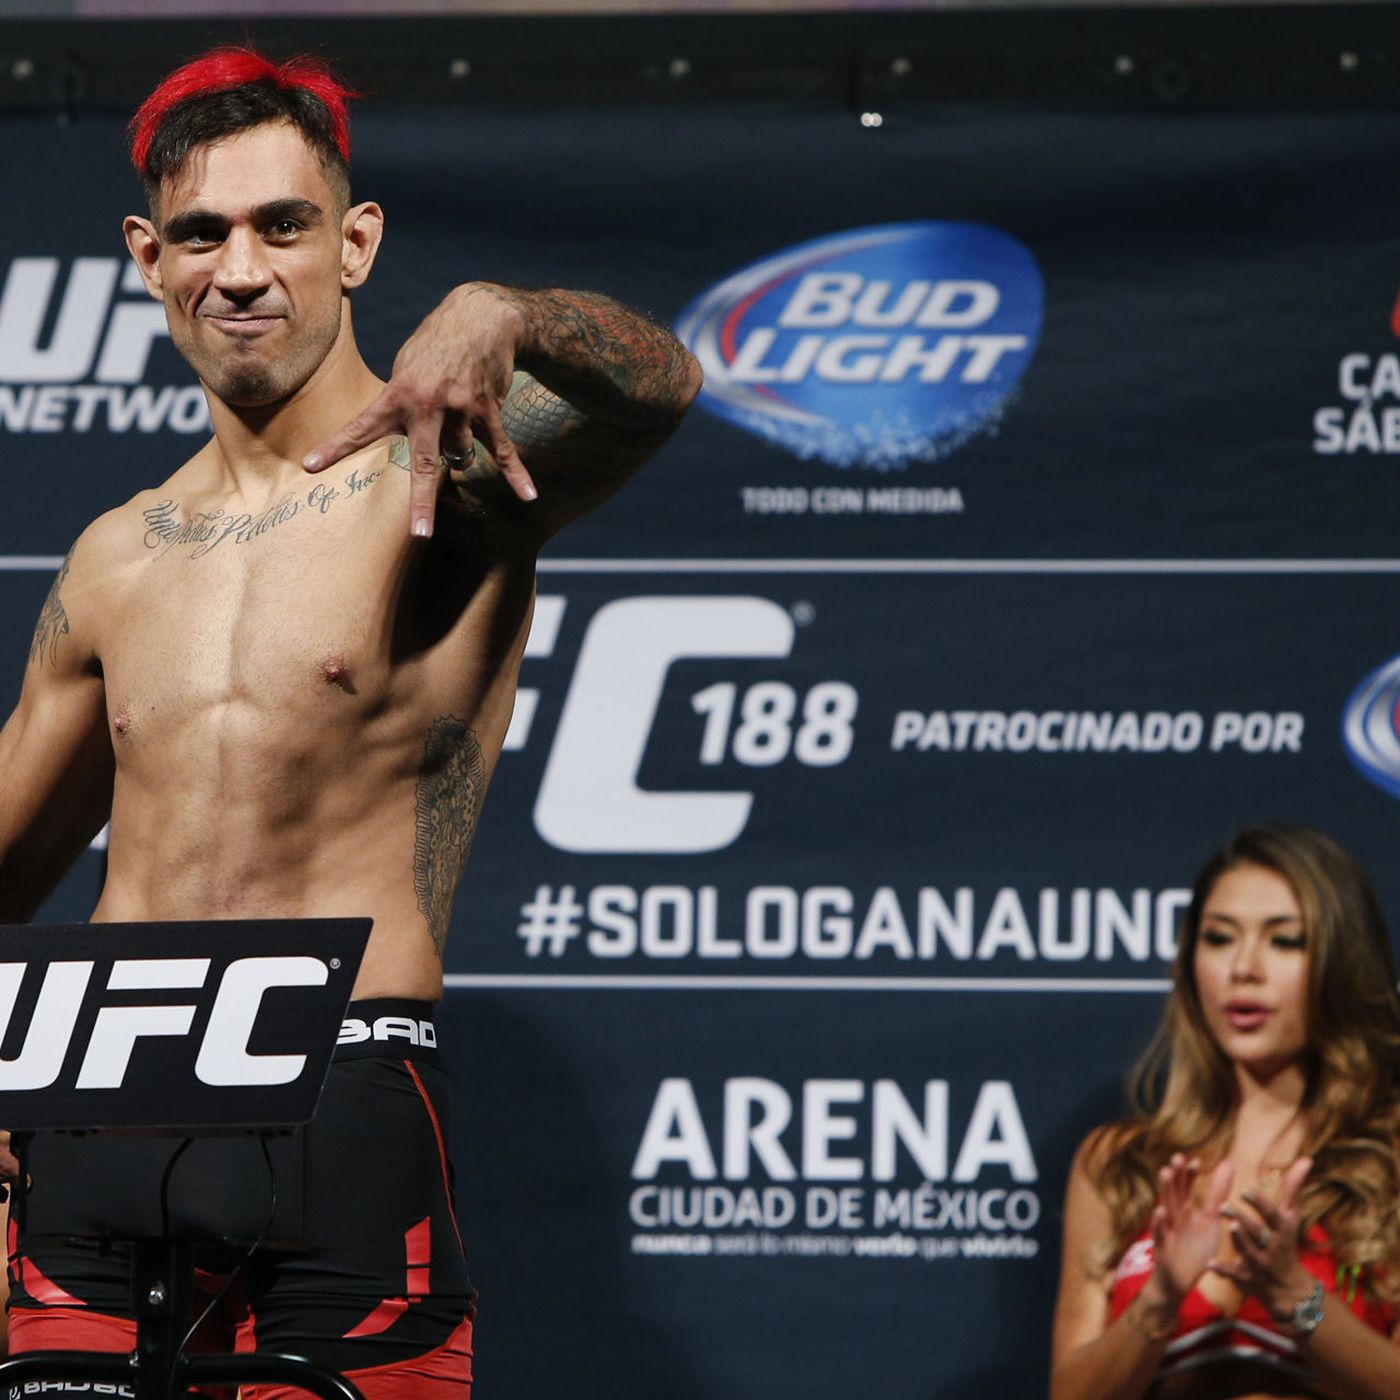 USADA won't sanction UFC's Augusto Montano for testing